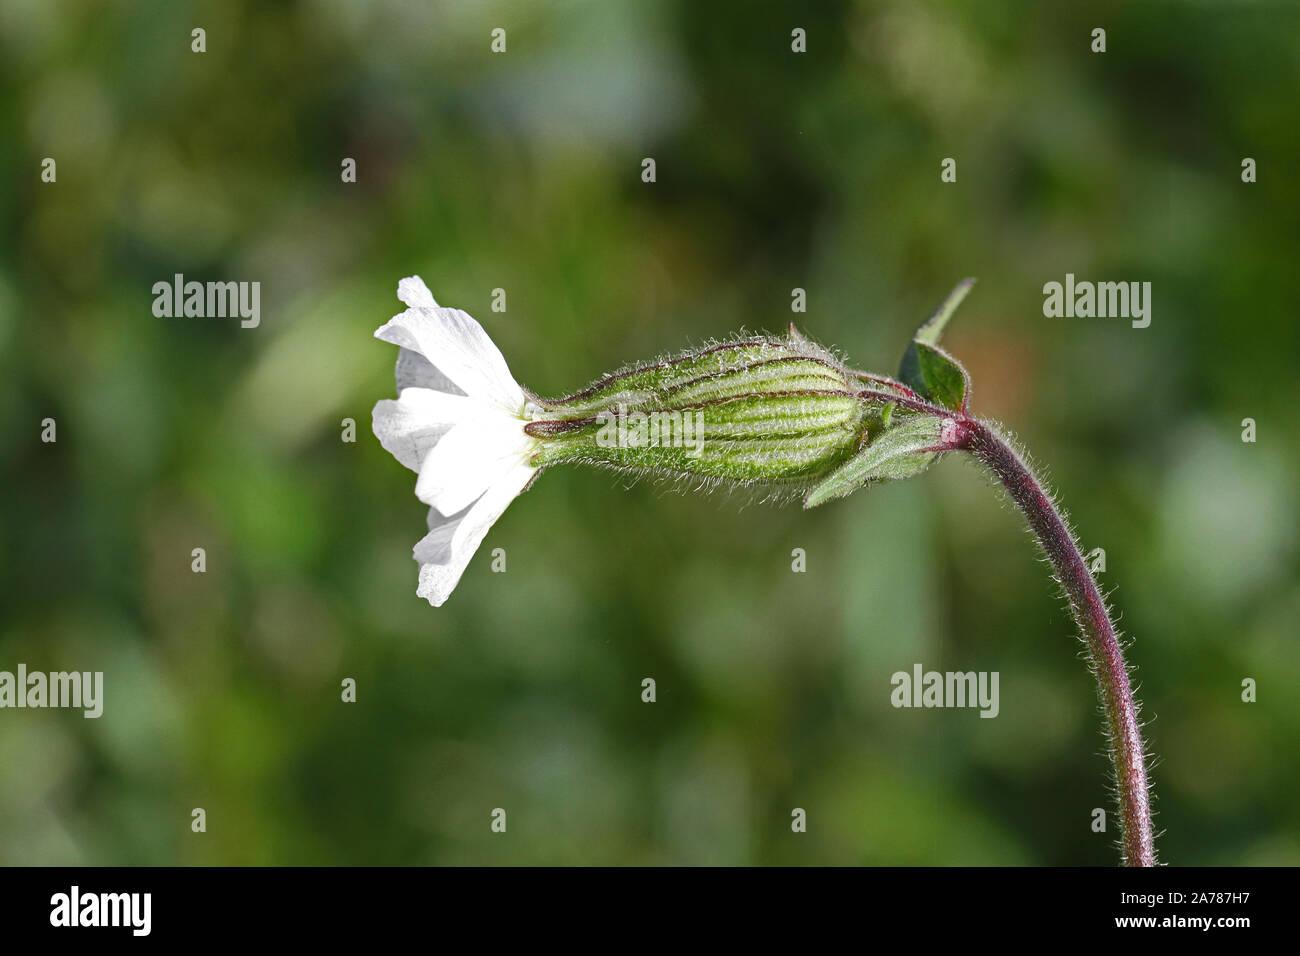 white campion similar to bladder campion or maidens tears Latin silene latifolia not vulgaris from the pink family caryophyllaceae edible wild flower Stock Photo